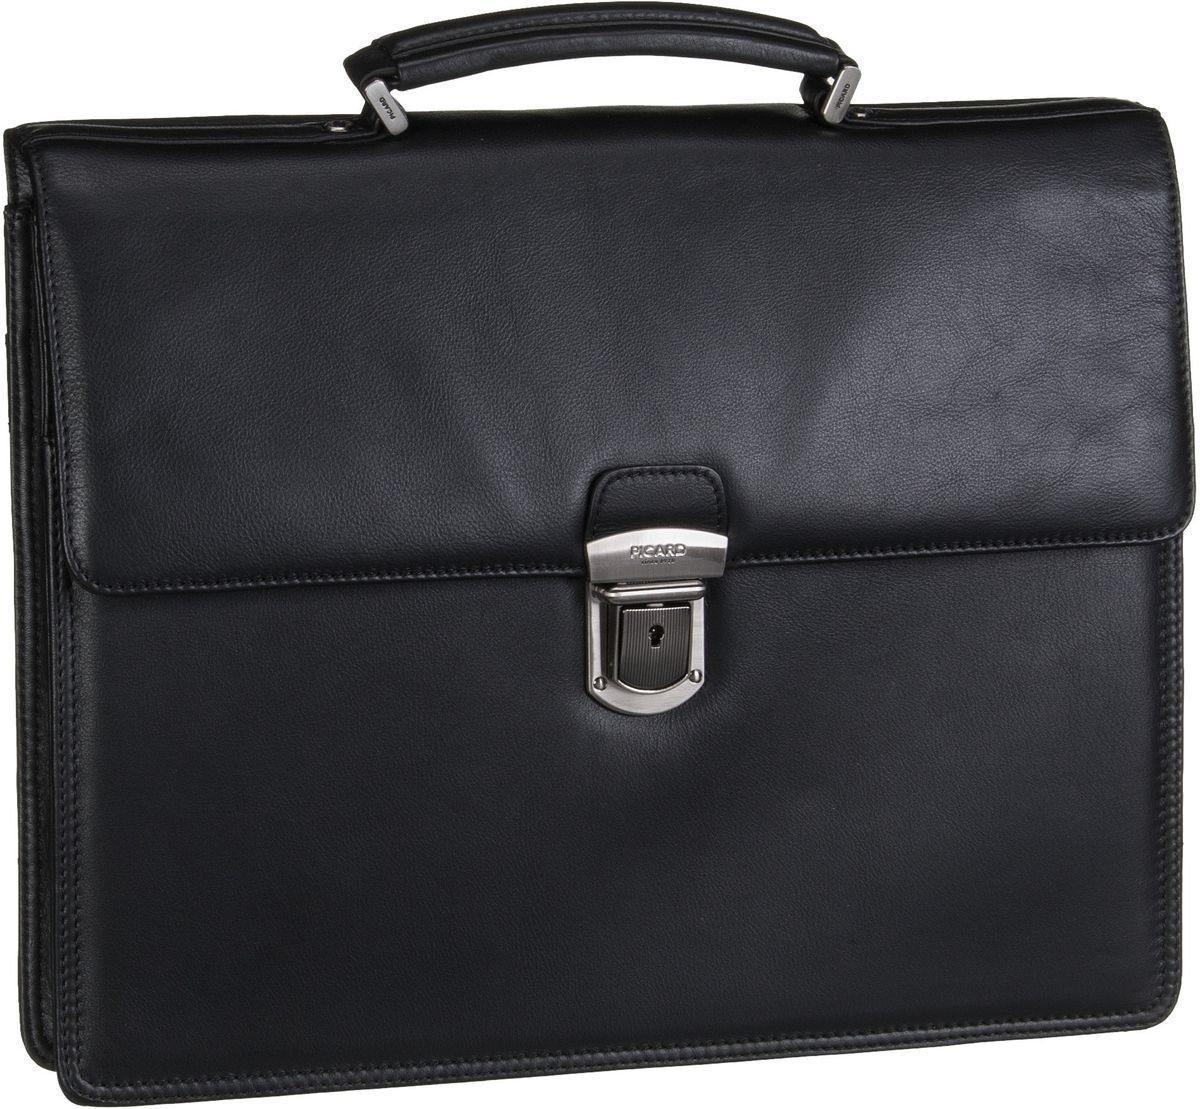 Picard Notebooktasche / Tablet »Retro 8938«